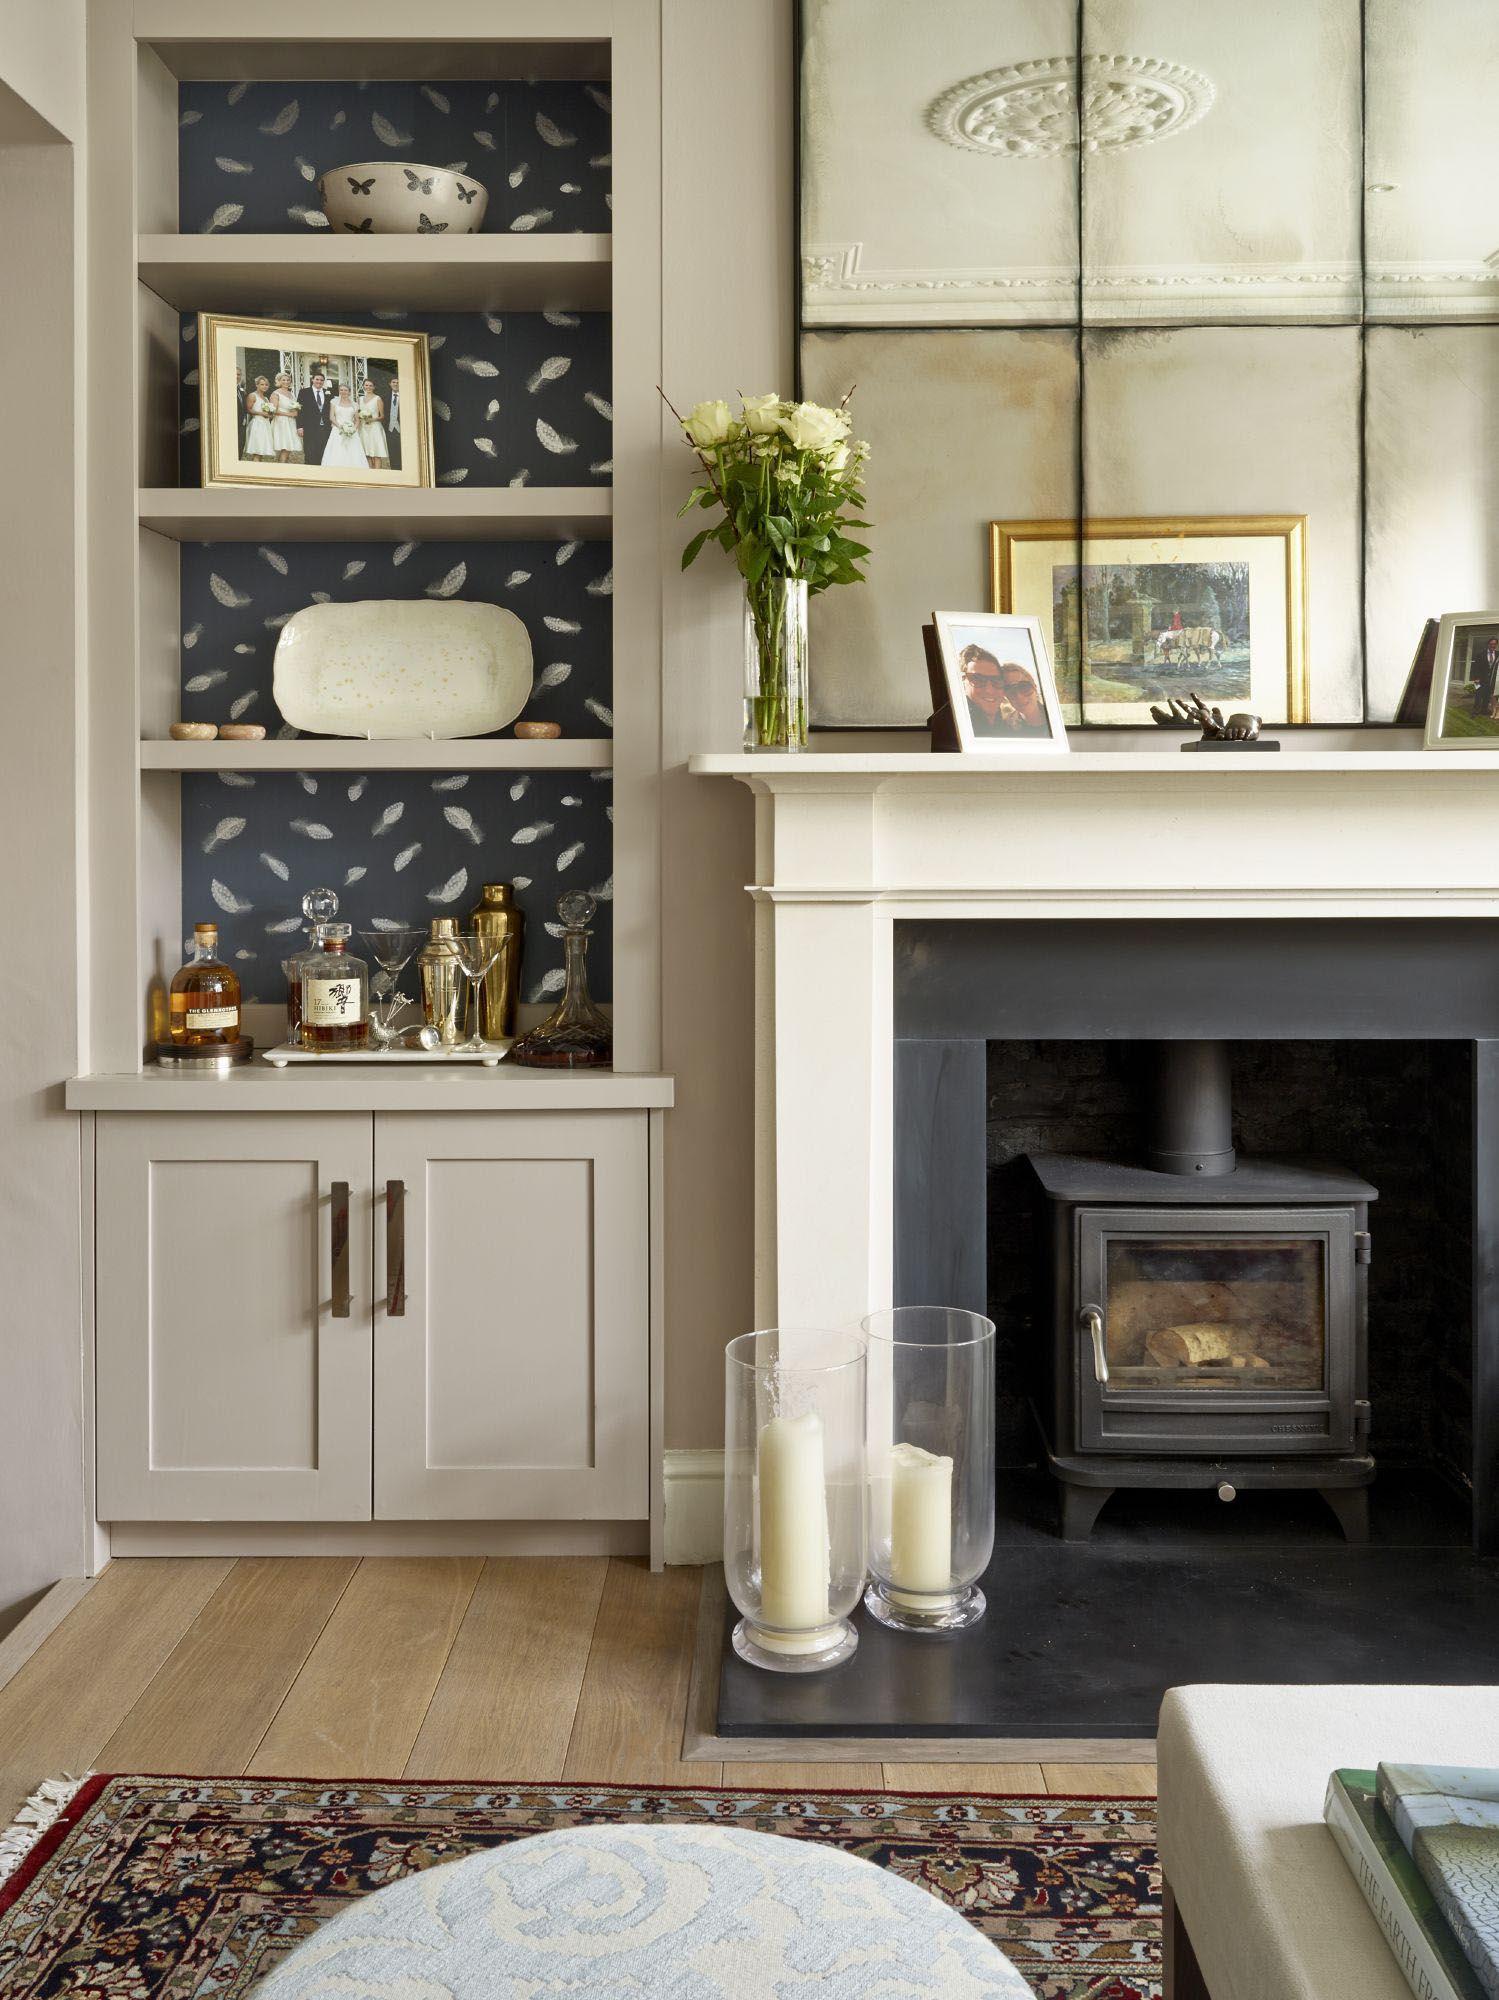 Advanced Fireplace Decorating Ideas Uk That Will Impress